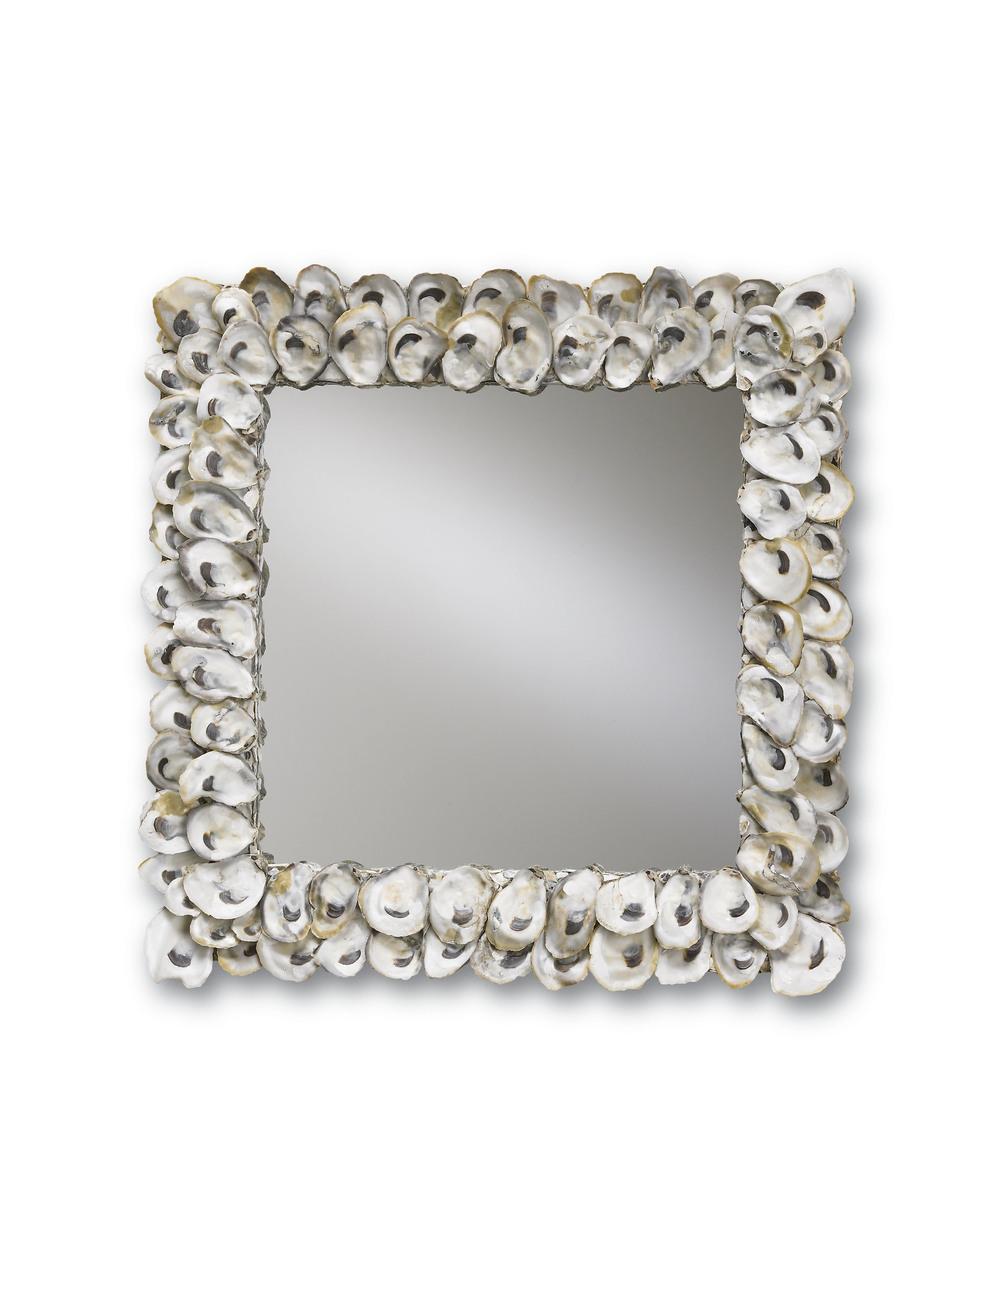 Currey & Company - Oyster Shell Mirror